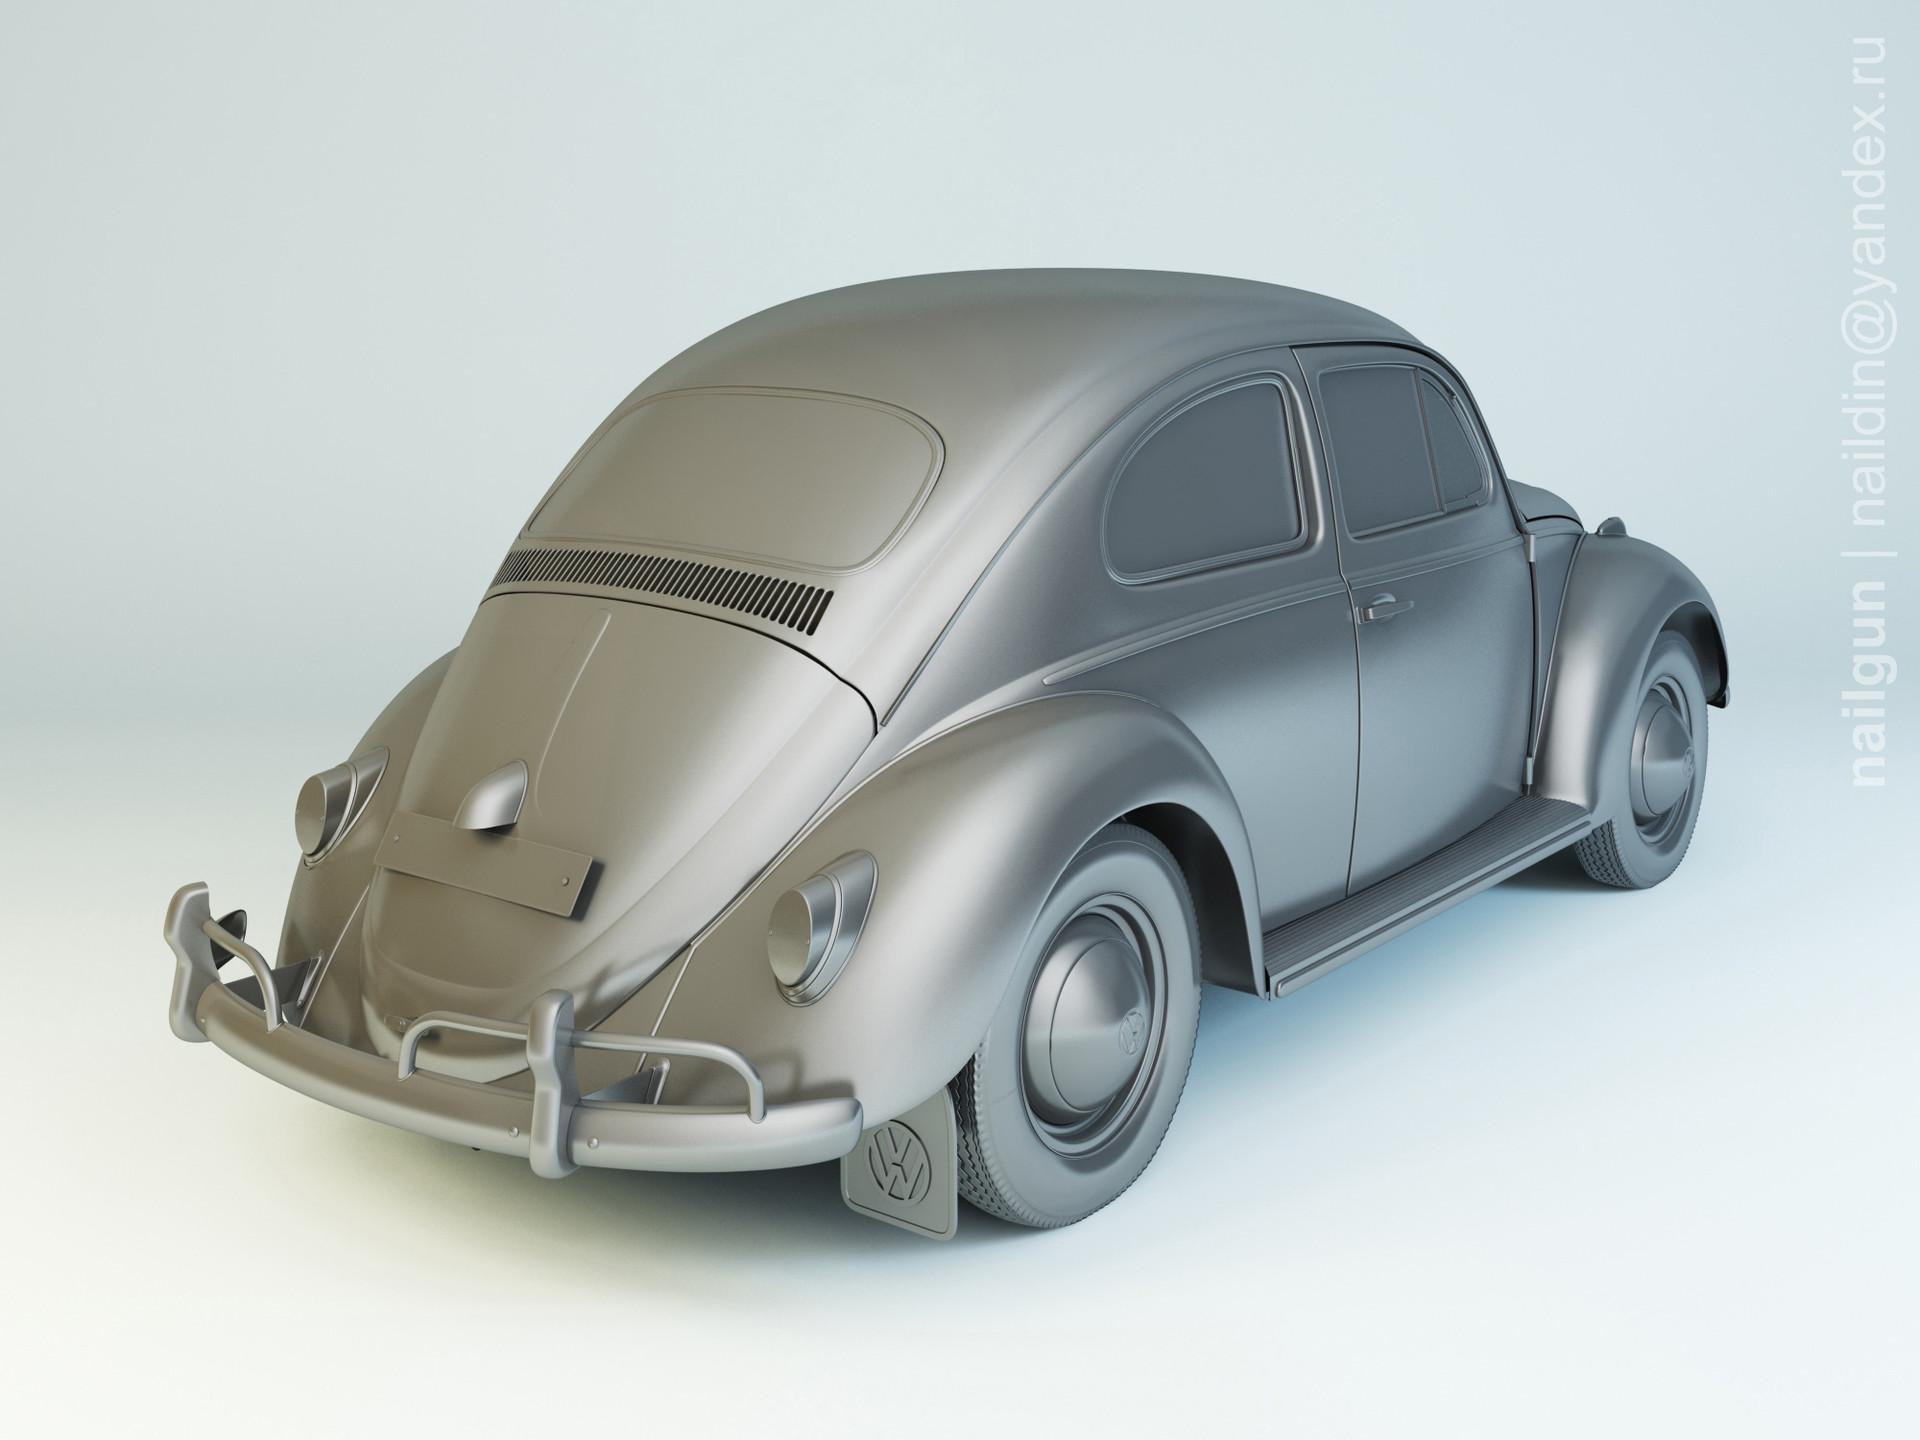 Nail khusnutdinov pwc 080 004 vw beetle 1200 modelling 1